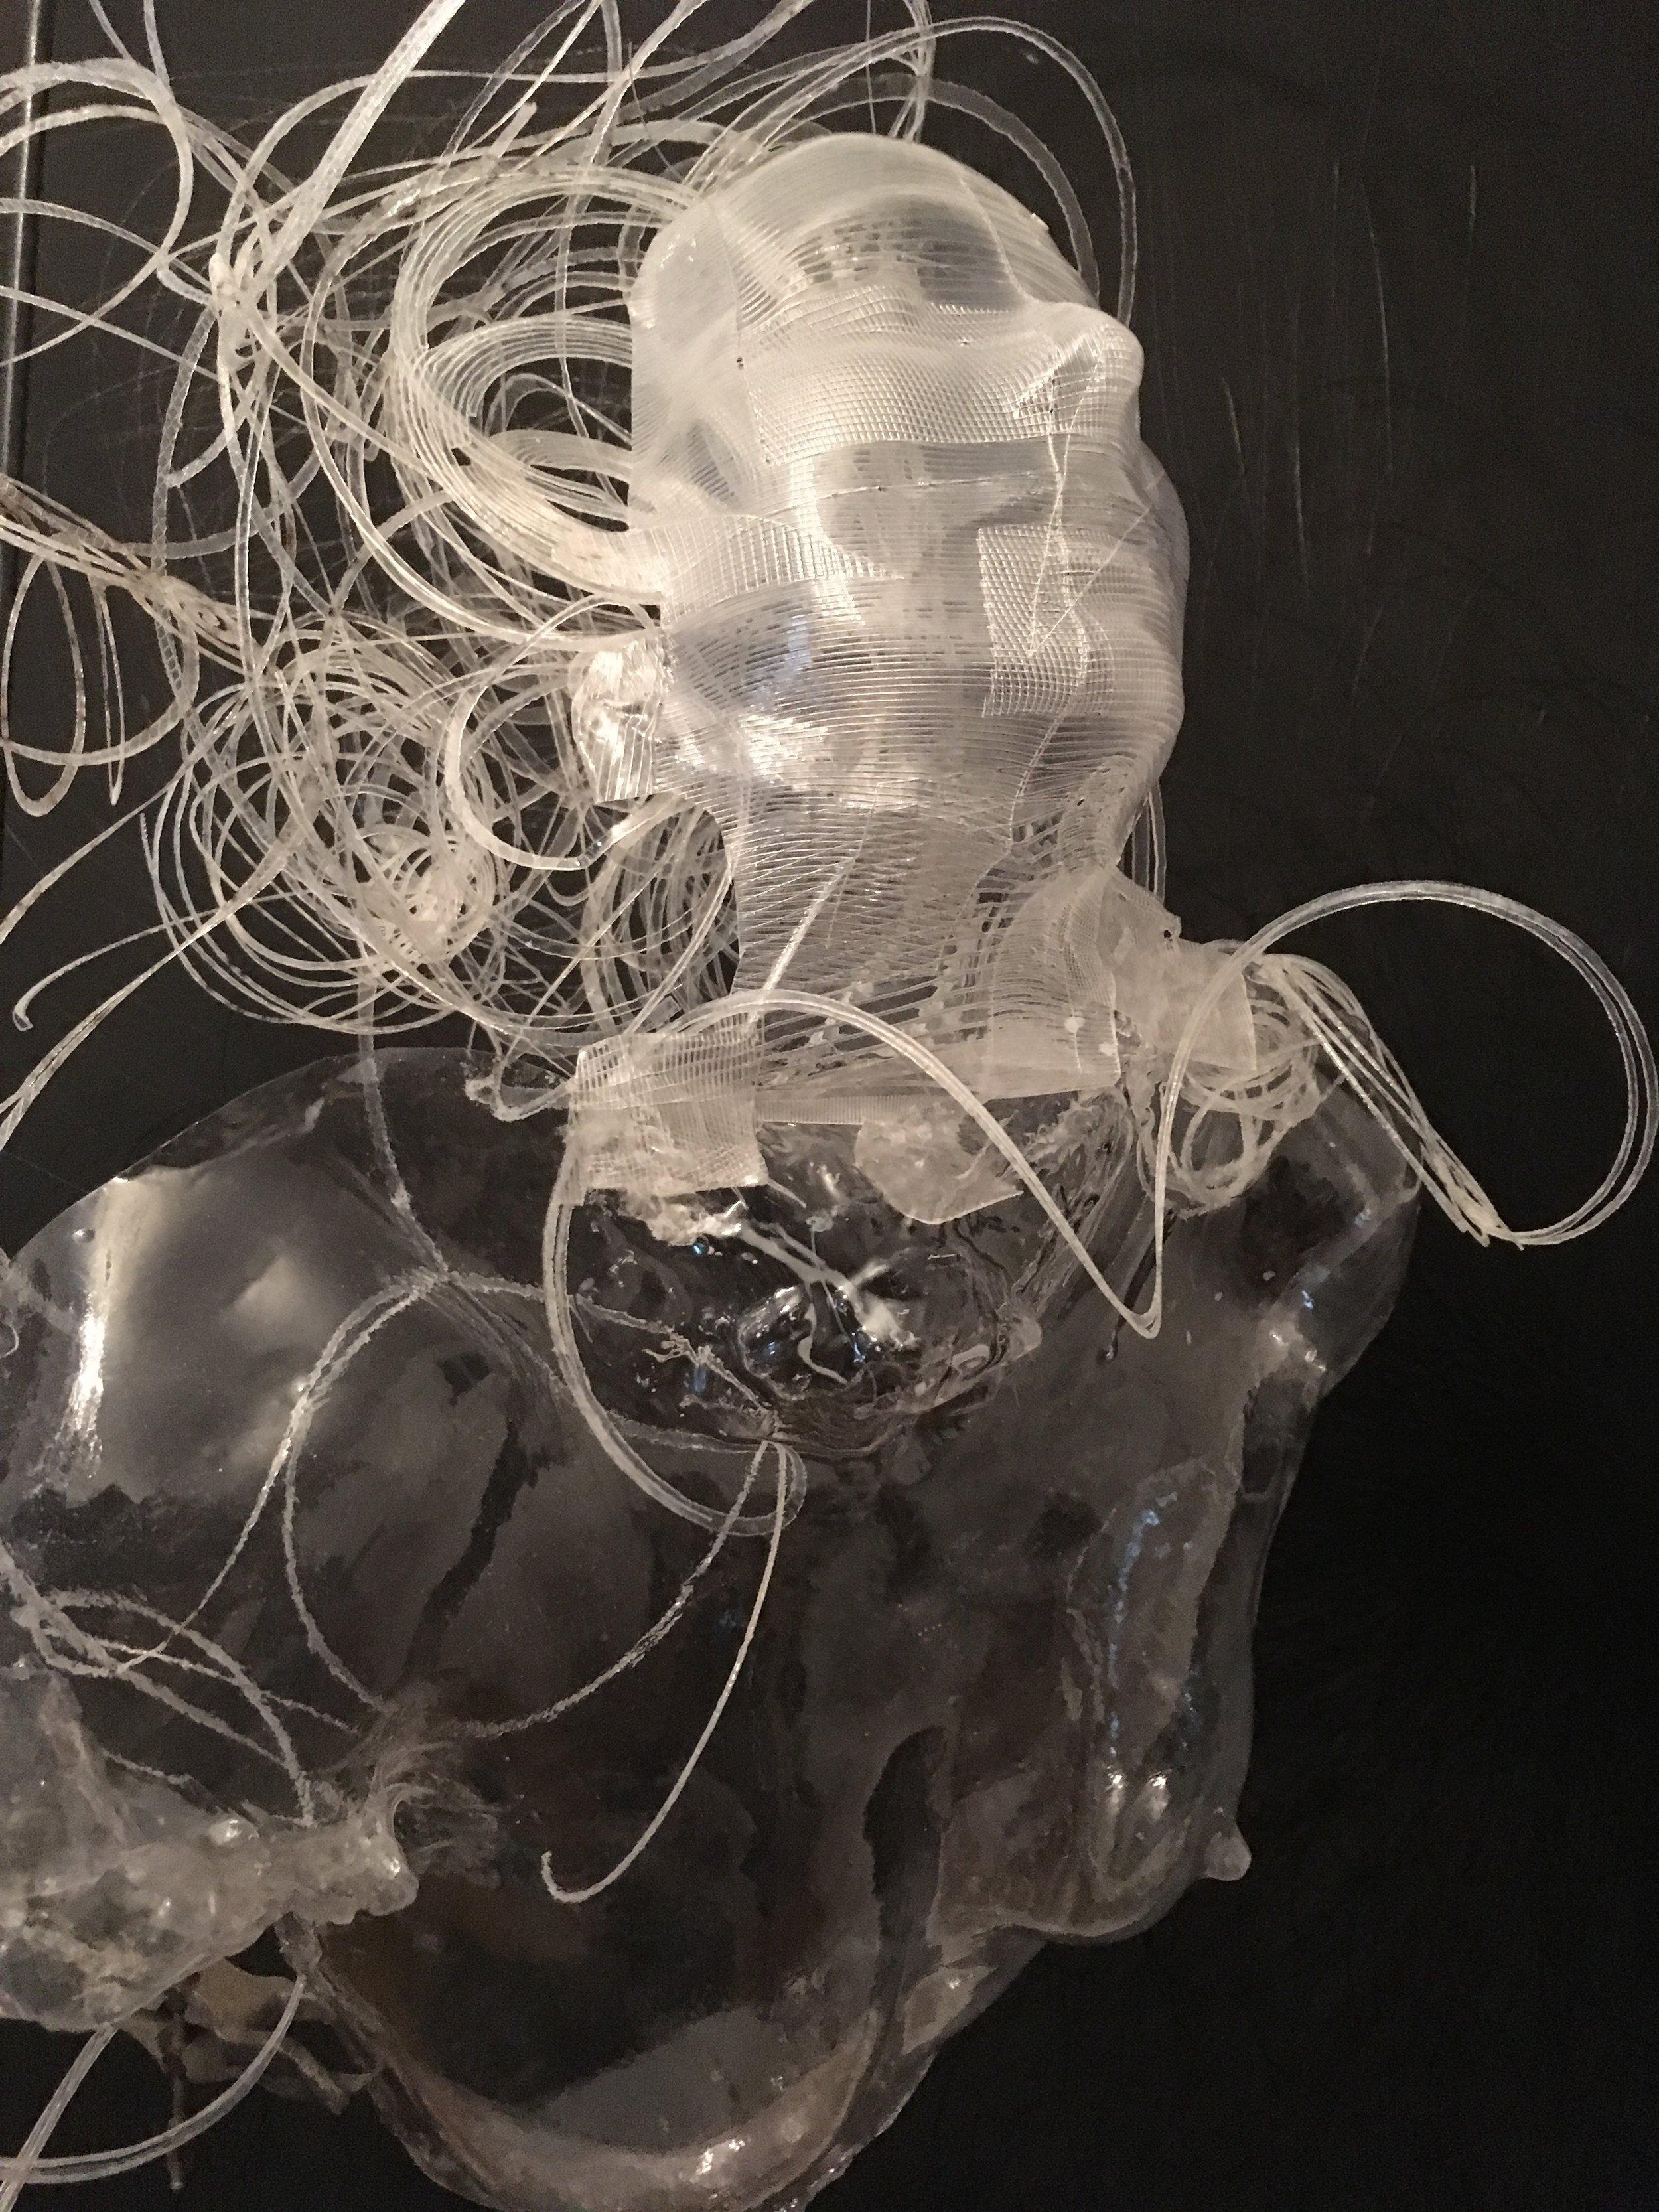 Dreaming of Schrodinger's Cat, 2016 in light and plastics. Image courtesy of Maria Katsika:  www.marinetanguyart.com